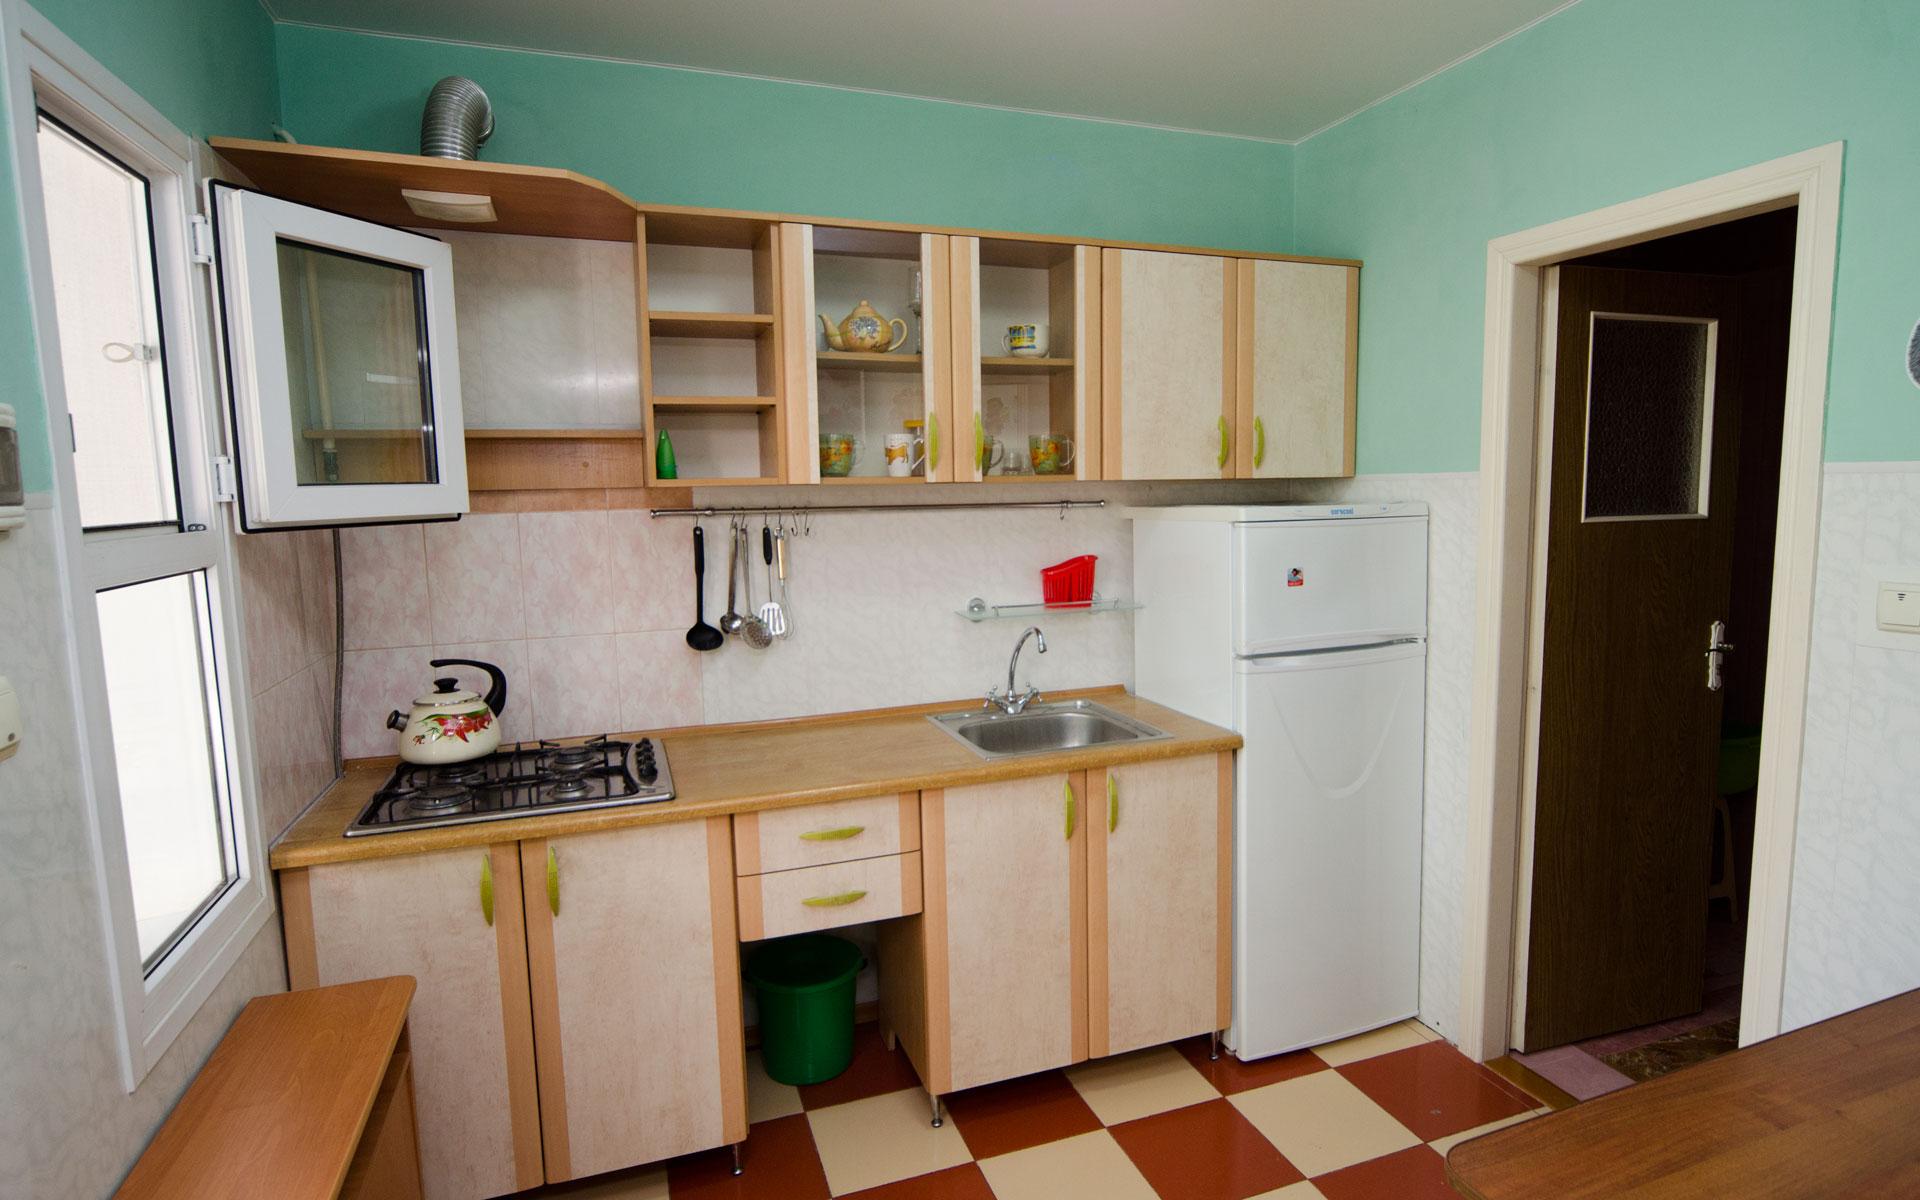 Кухня. Квартира 1. 2 квартиры на ул. Гайдара. Заозёрное